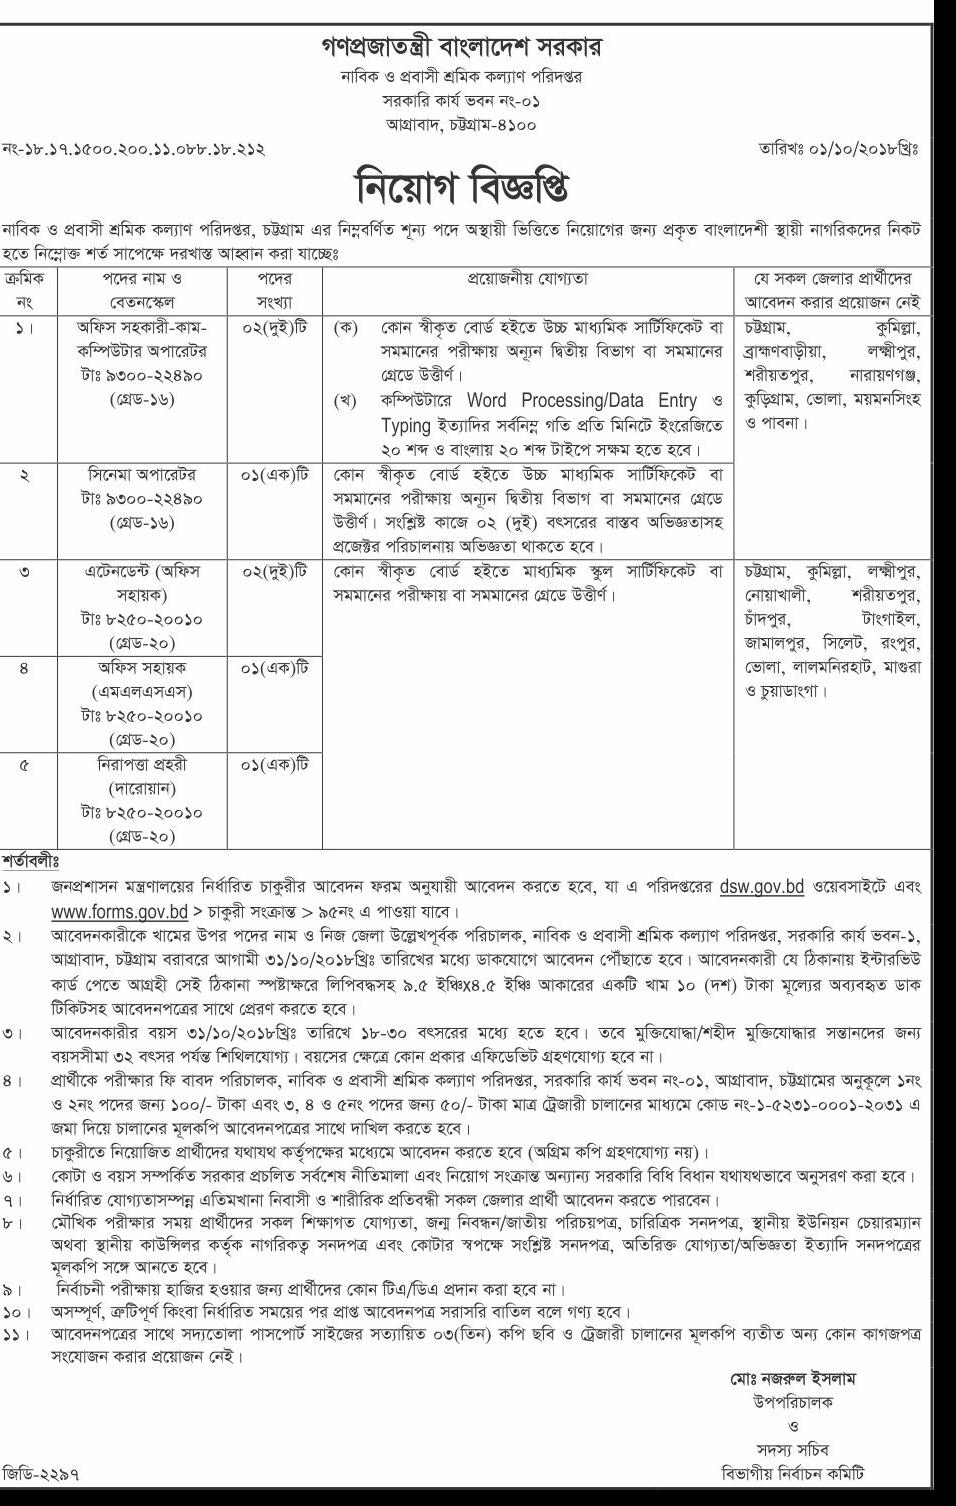 Seamen Welfare & Emigration Directorate Job Circular 2018